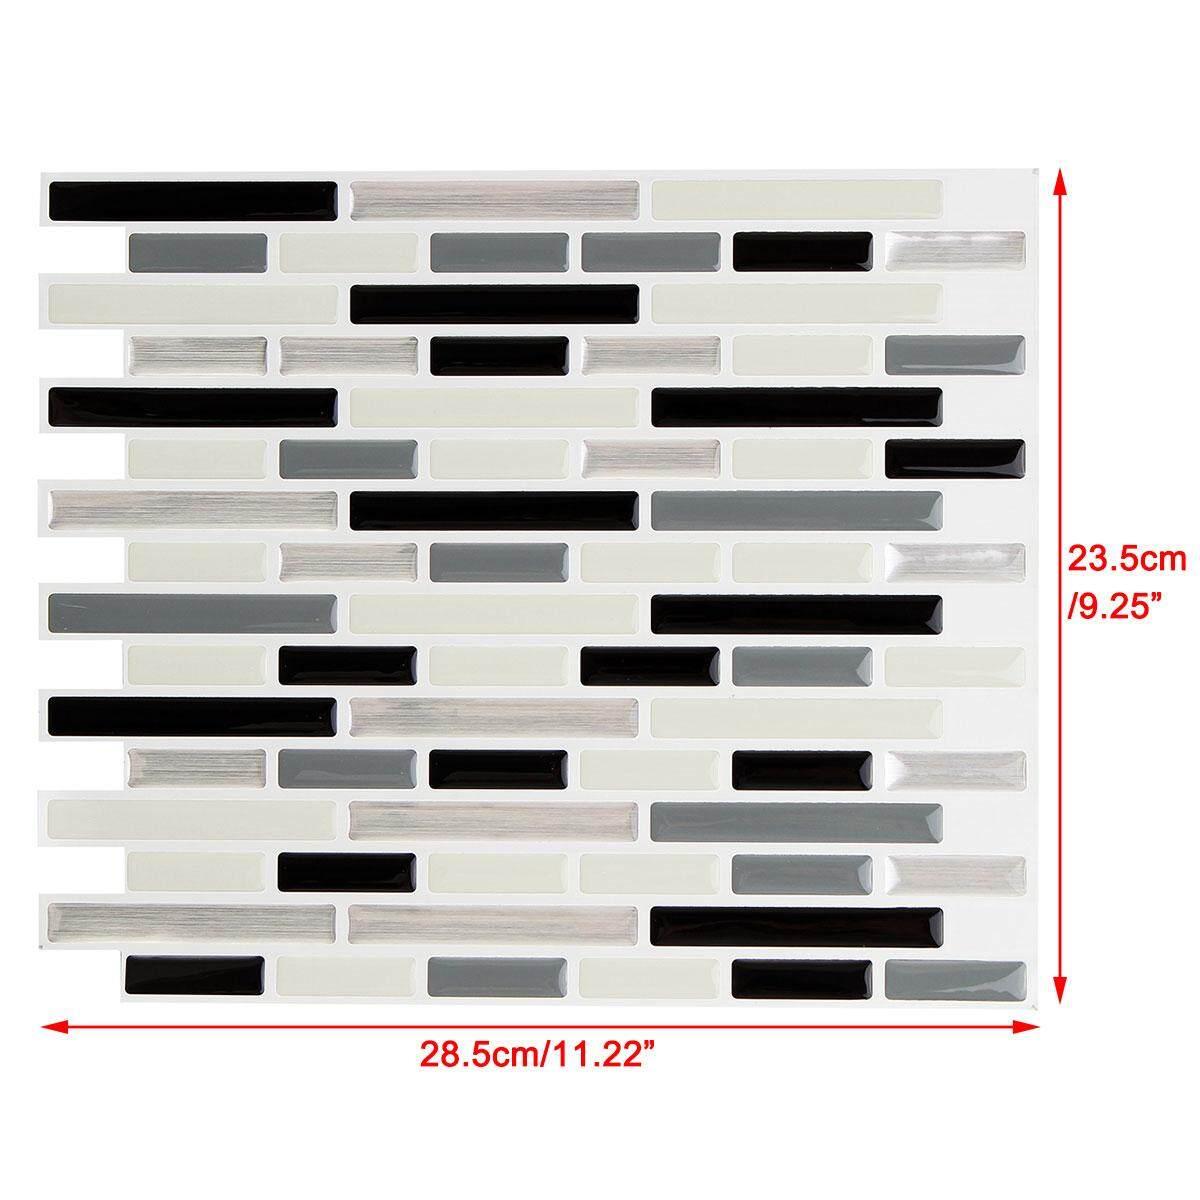 【Flash Deal】Gray Home Decor Brick Mosaic Kitchen Bathroom Foil Beauty 3D Wallpaper Sticker Tile